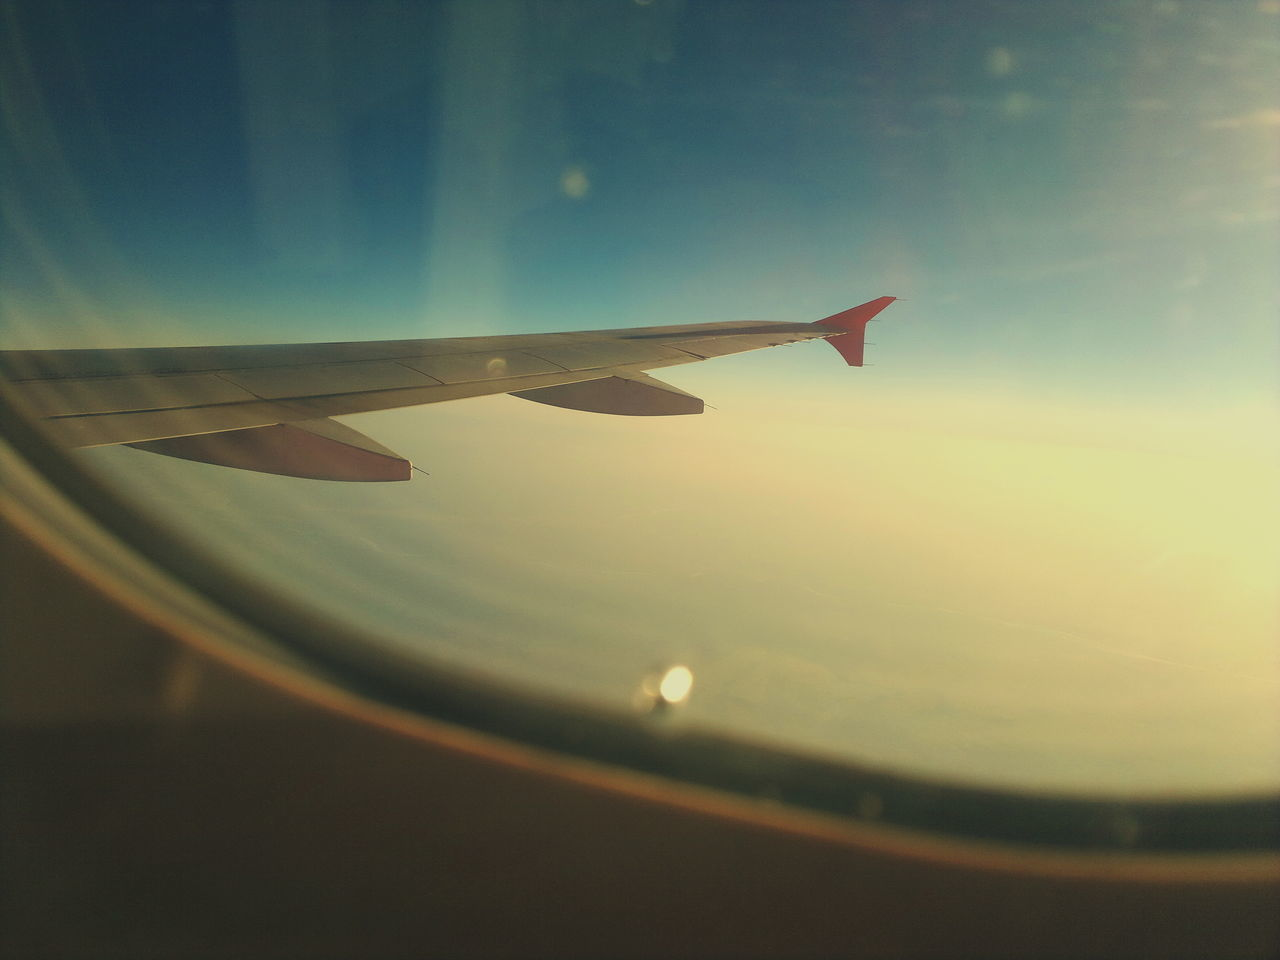 Airplane Airplane Wing Nature No People Nokia  Outdoors Scenics Sky Sun Sunlight Sunrise